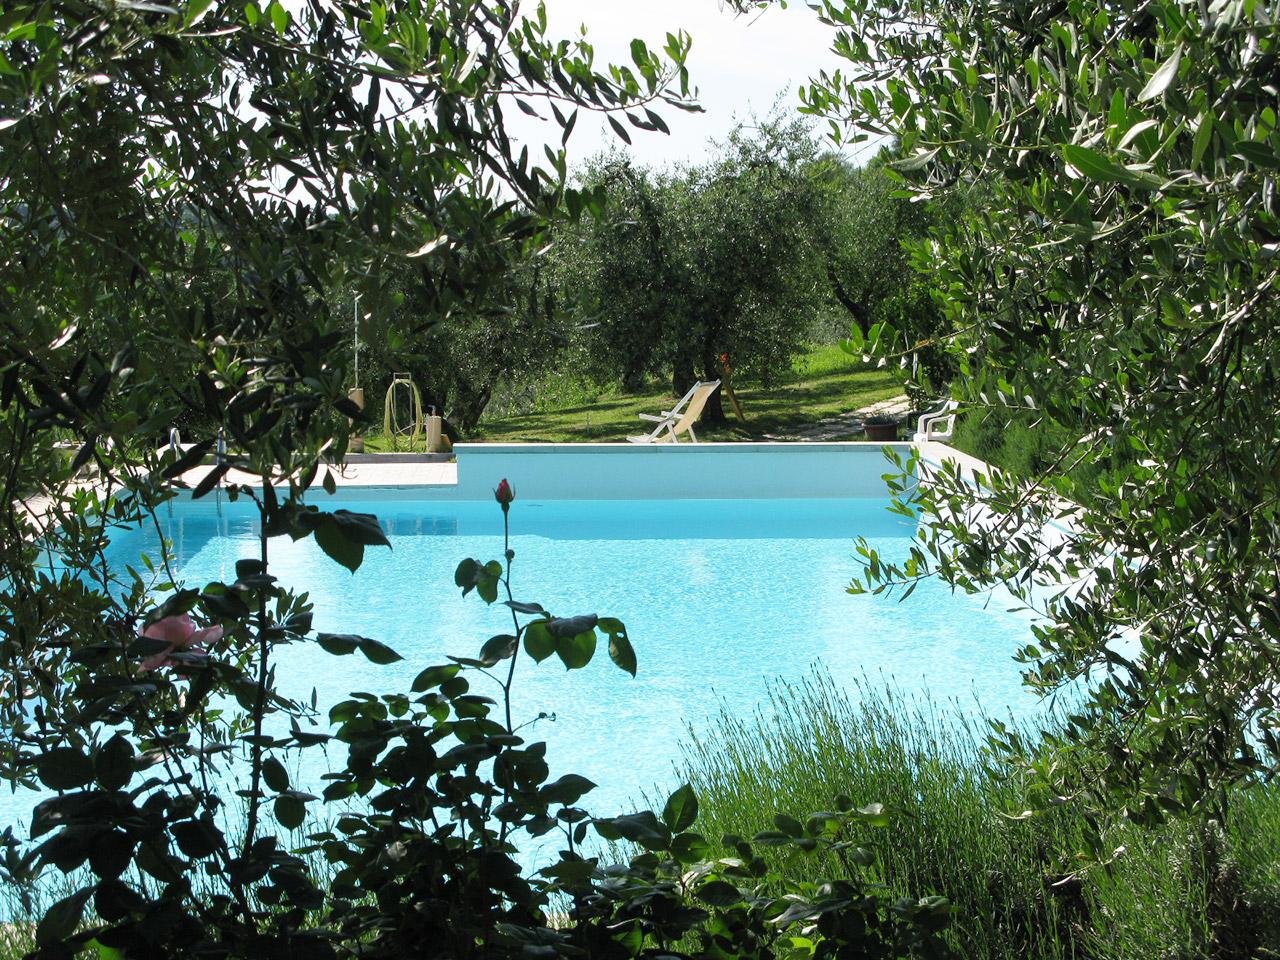 piscina02_toscananascosta